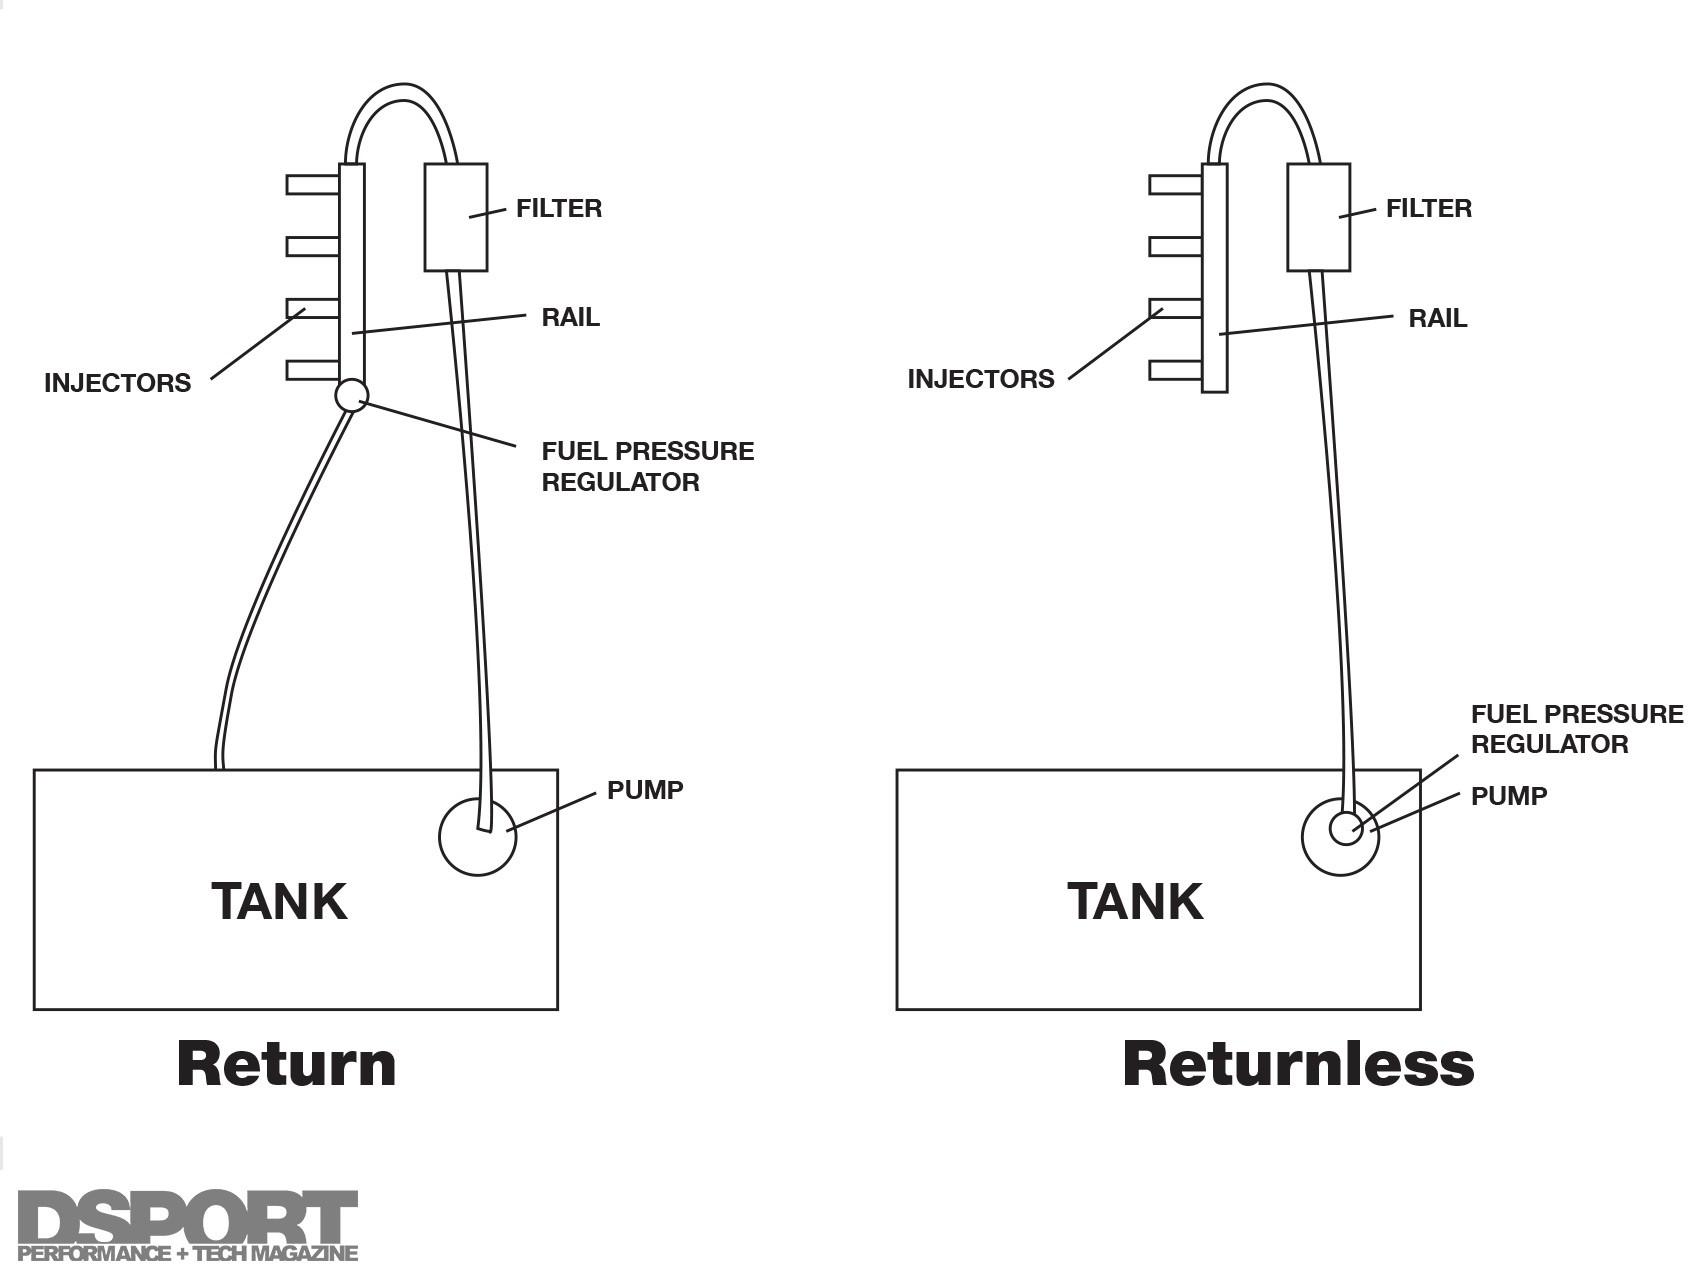 Nissan Fuel System Diagram Modern Design Of Wiring Titan Diagrams 350z Rail Radio Micra Frontier